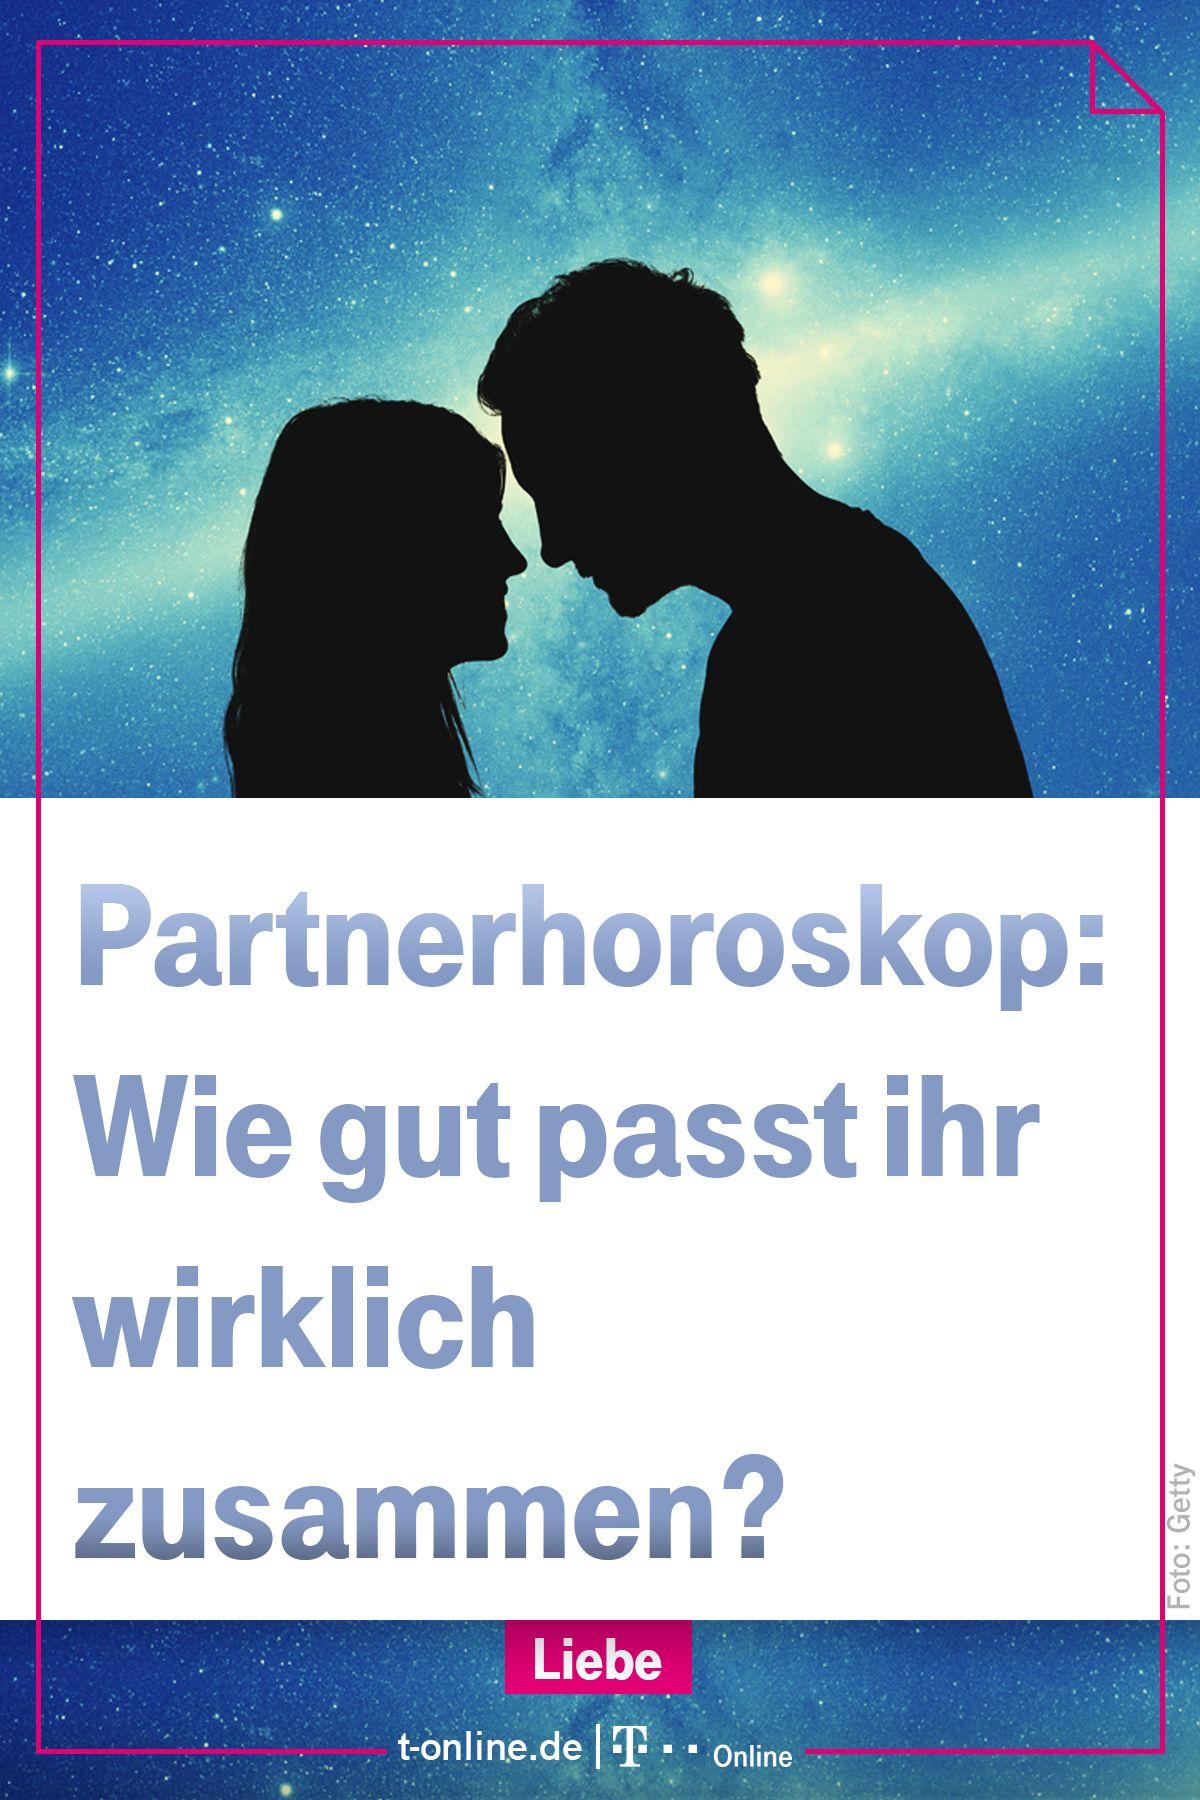 HOROSKOP für Partnerschaft Beziehung und Ehe Partnerhoroskop